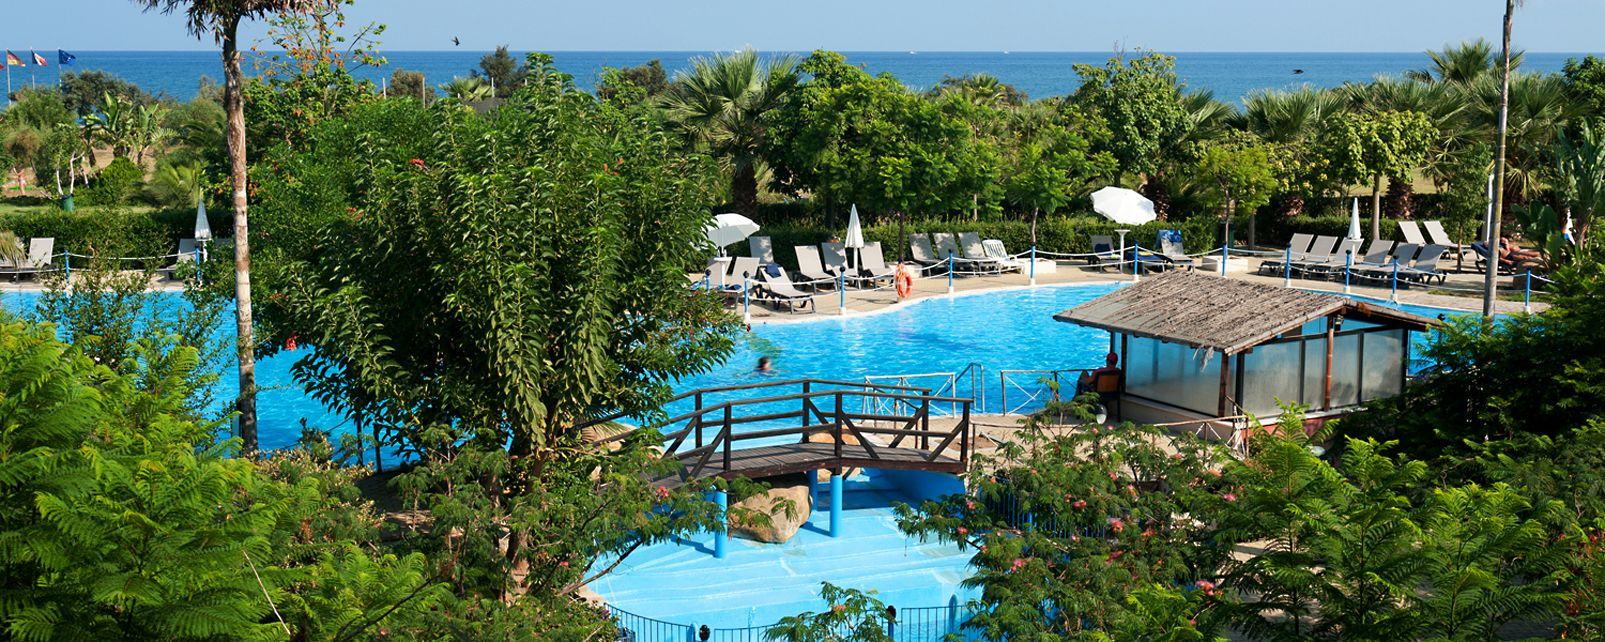 Hotel Fiesta Garden Beach